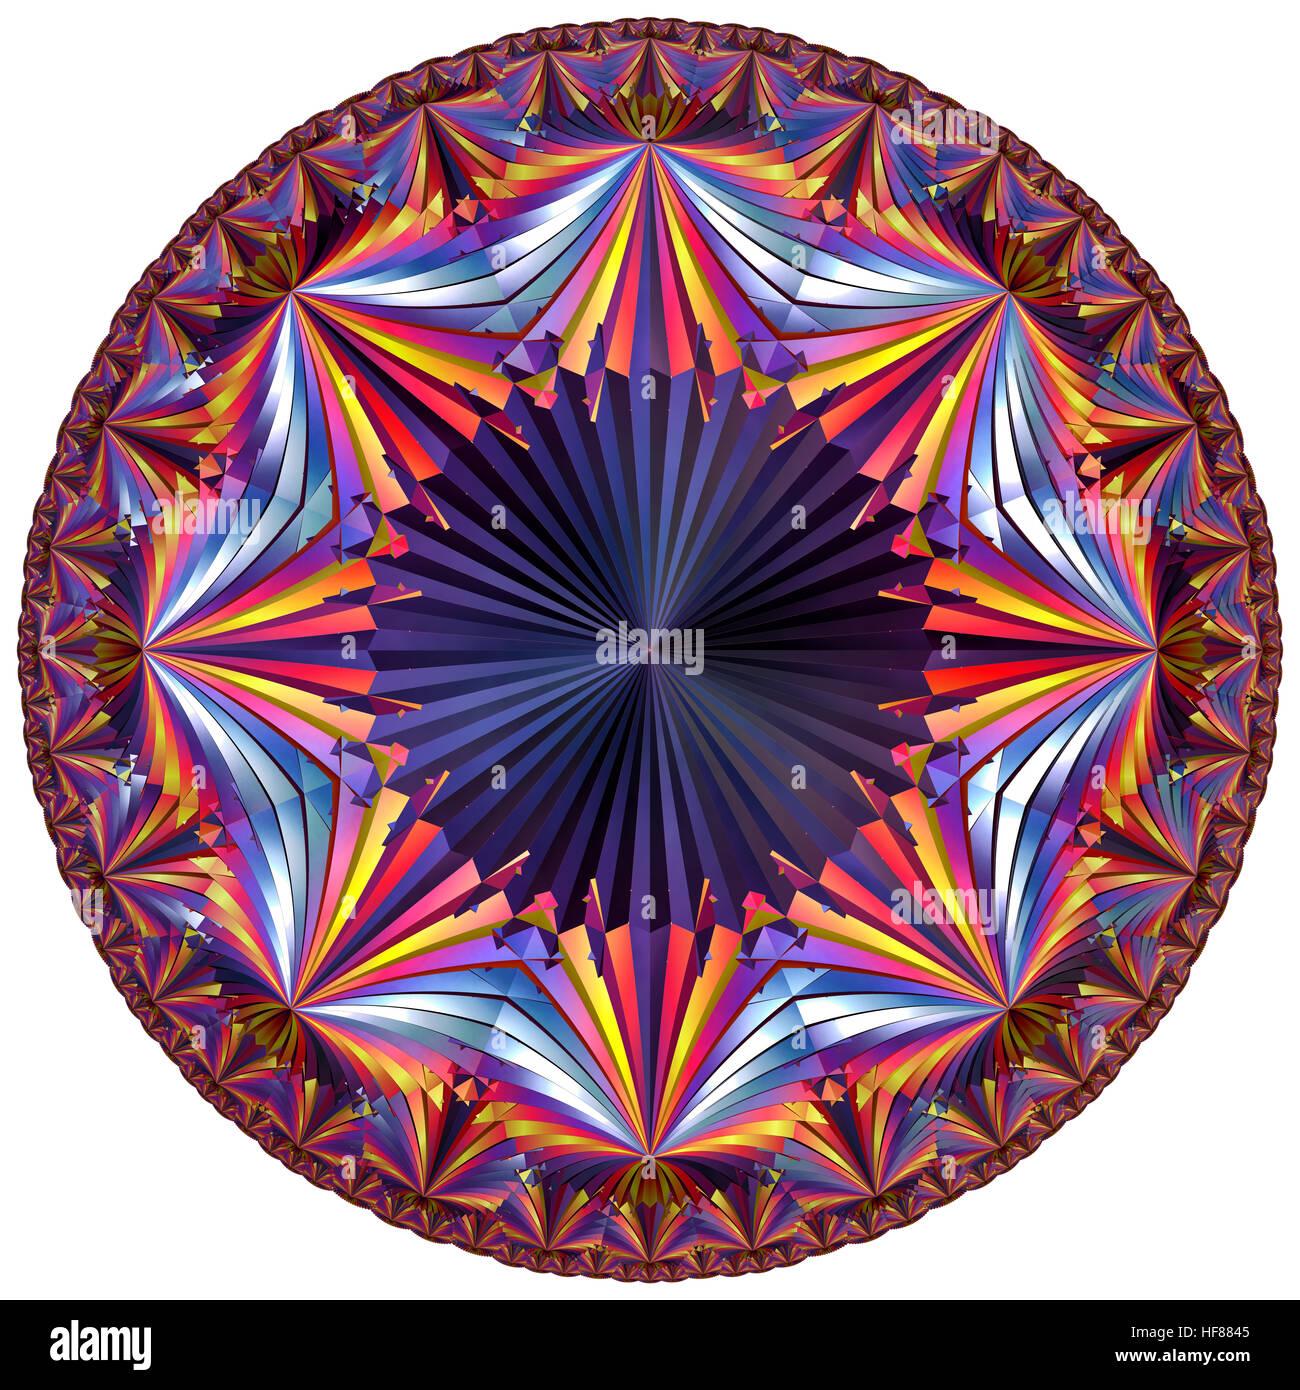 fractal colored hyperbolic tesselation - Stock Image